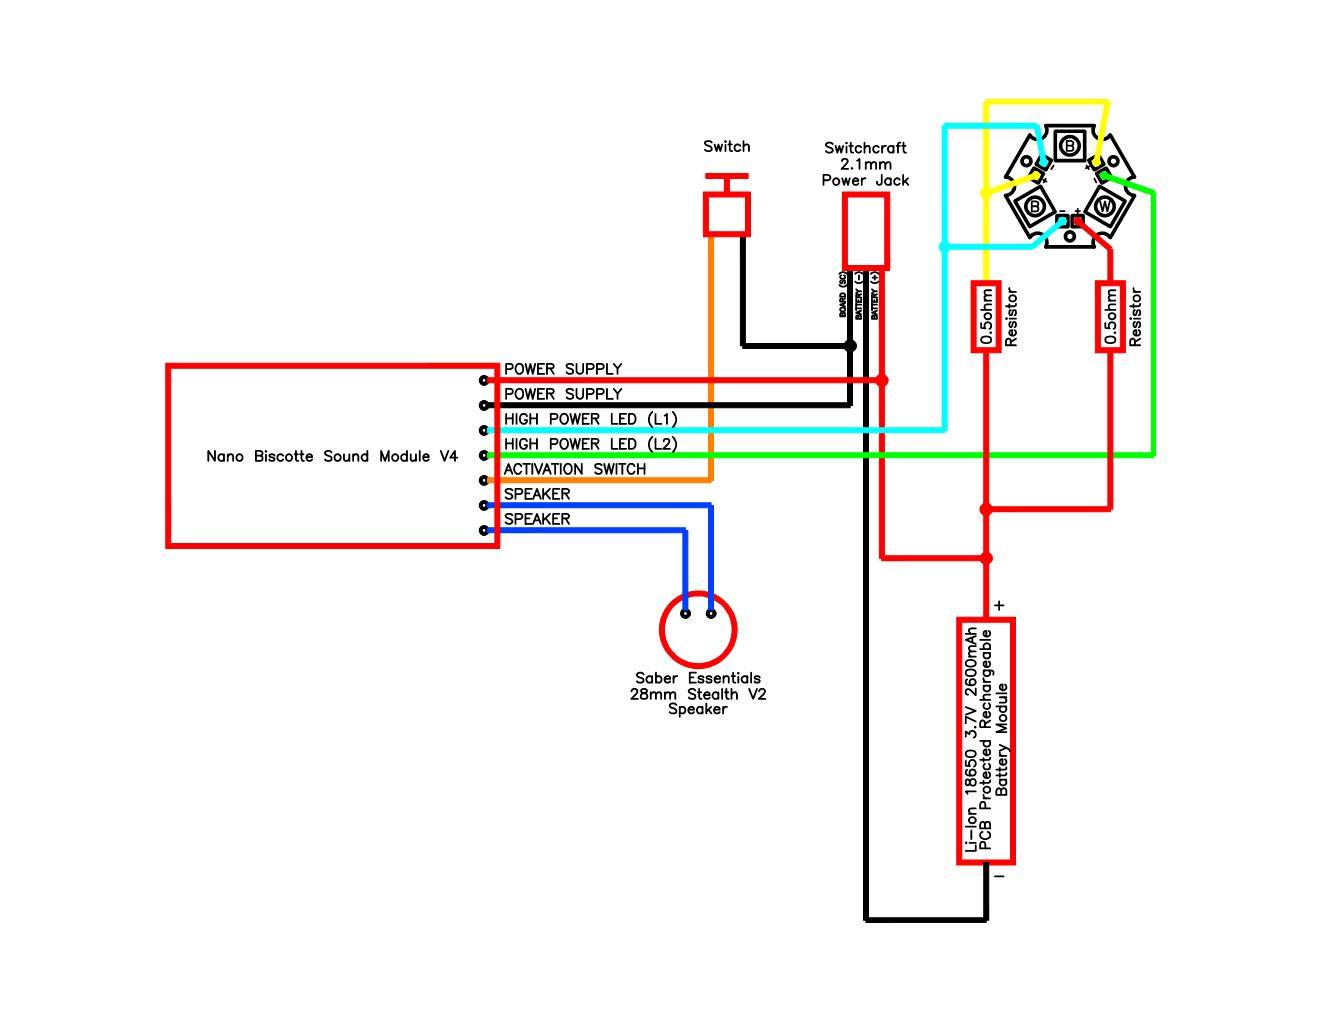 Nano Biscotte V4 Wiring Diagram : Lightsabers - Nano Biscotte V4 Wiring Diagram